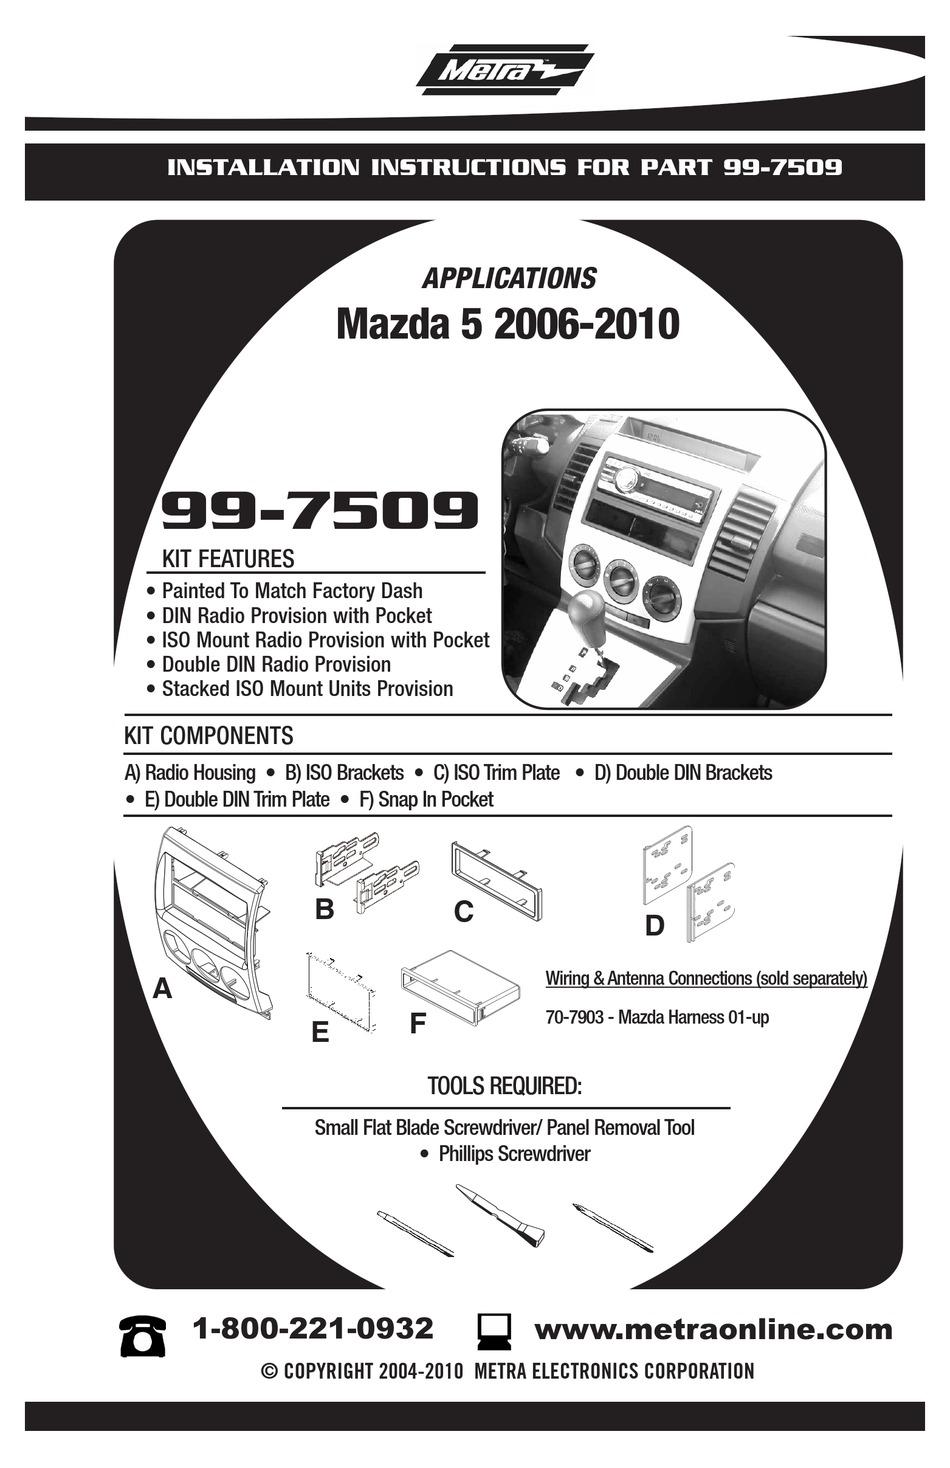 MAZDA 99-7509 INSTALLATION INSTRUCTIONS MANUAL Pdf